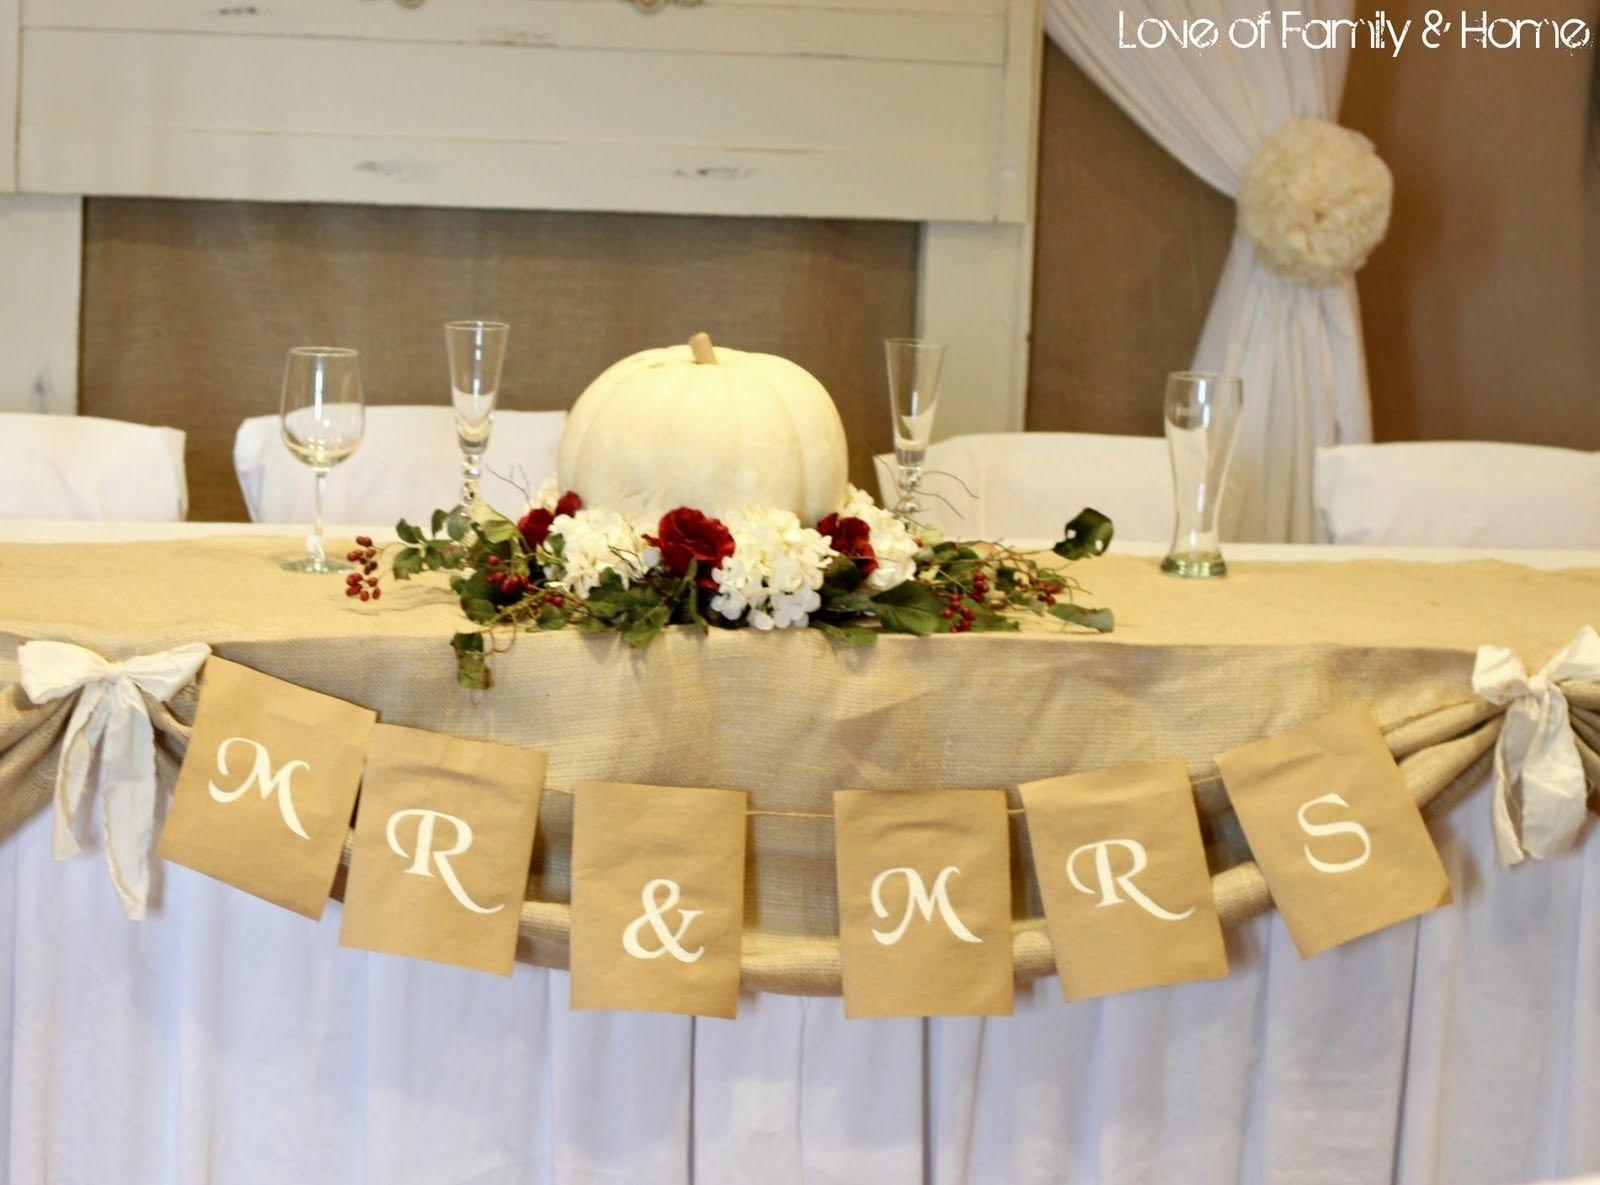 10 Wonderful Cheap Centerpiece Ideas For Wedding ideas on a budget fall wedding decorations diy decoration cheap 2020